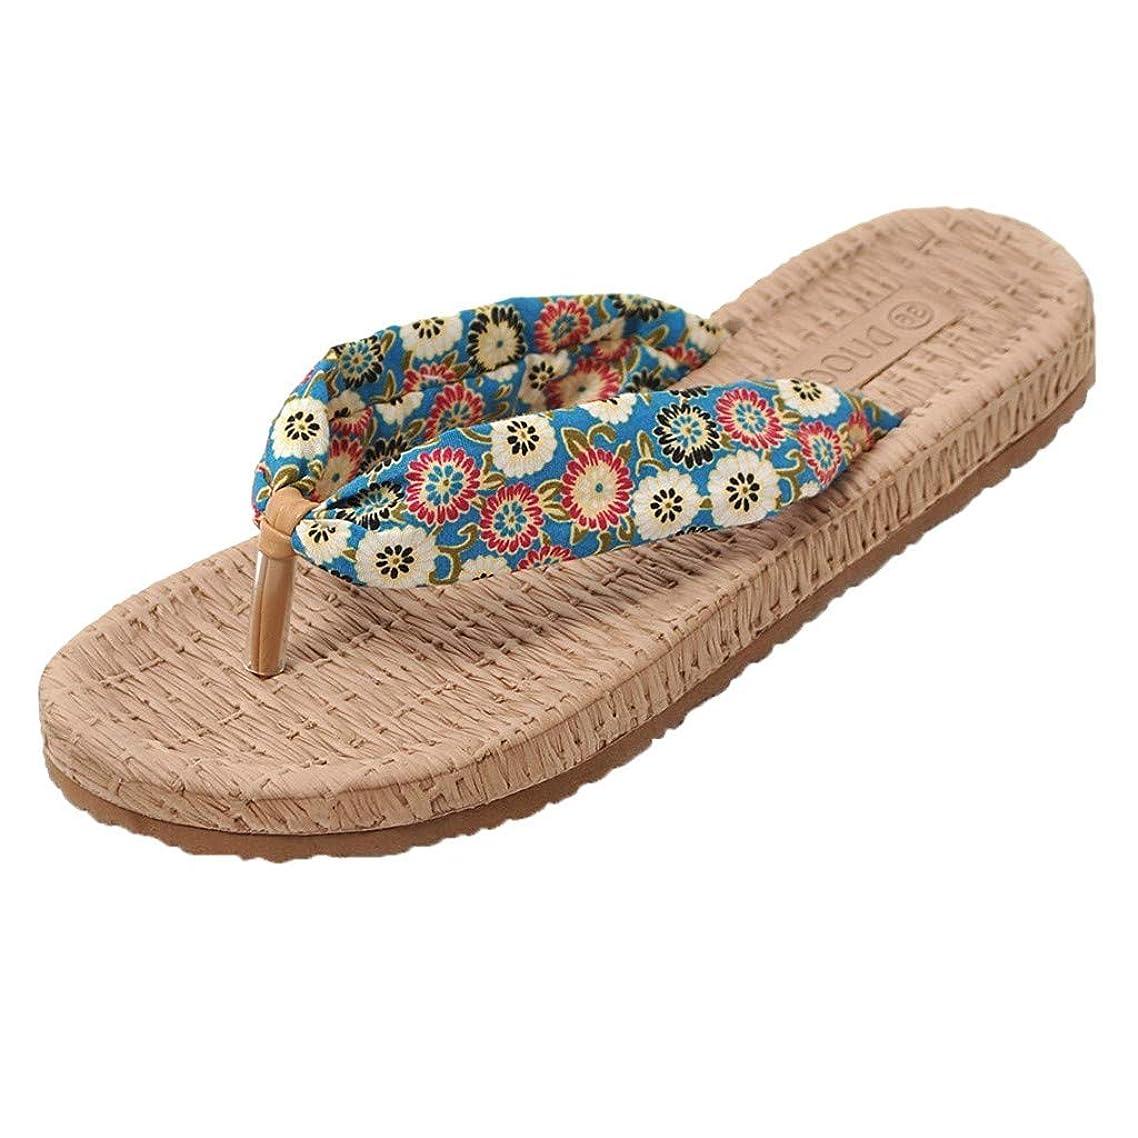 Aunimeifly Ladies Summer Stylish Shoes Flower Print Beach Slides Bohemian Slippers Clip Toe Flats Cane Flip Flops